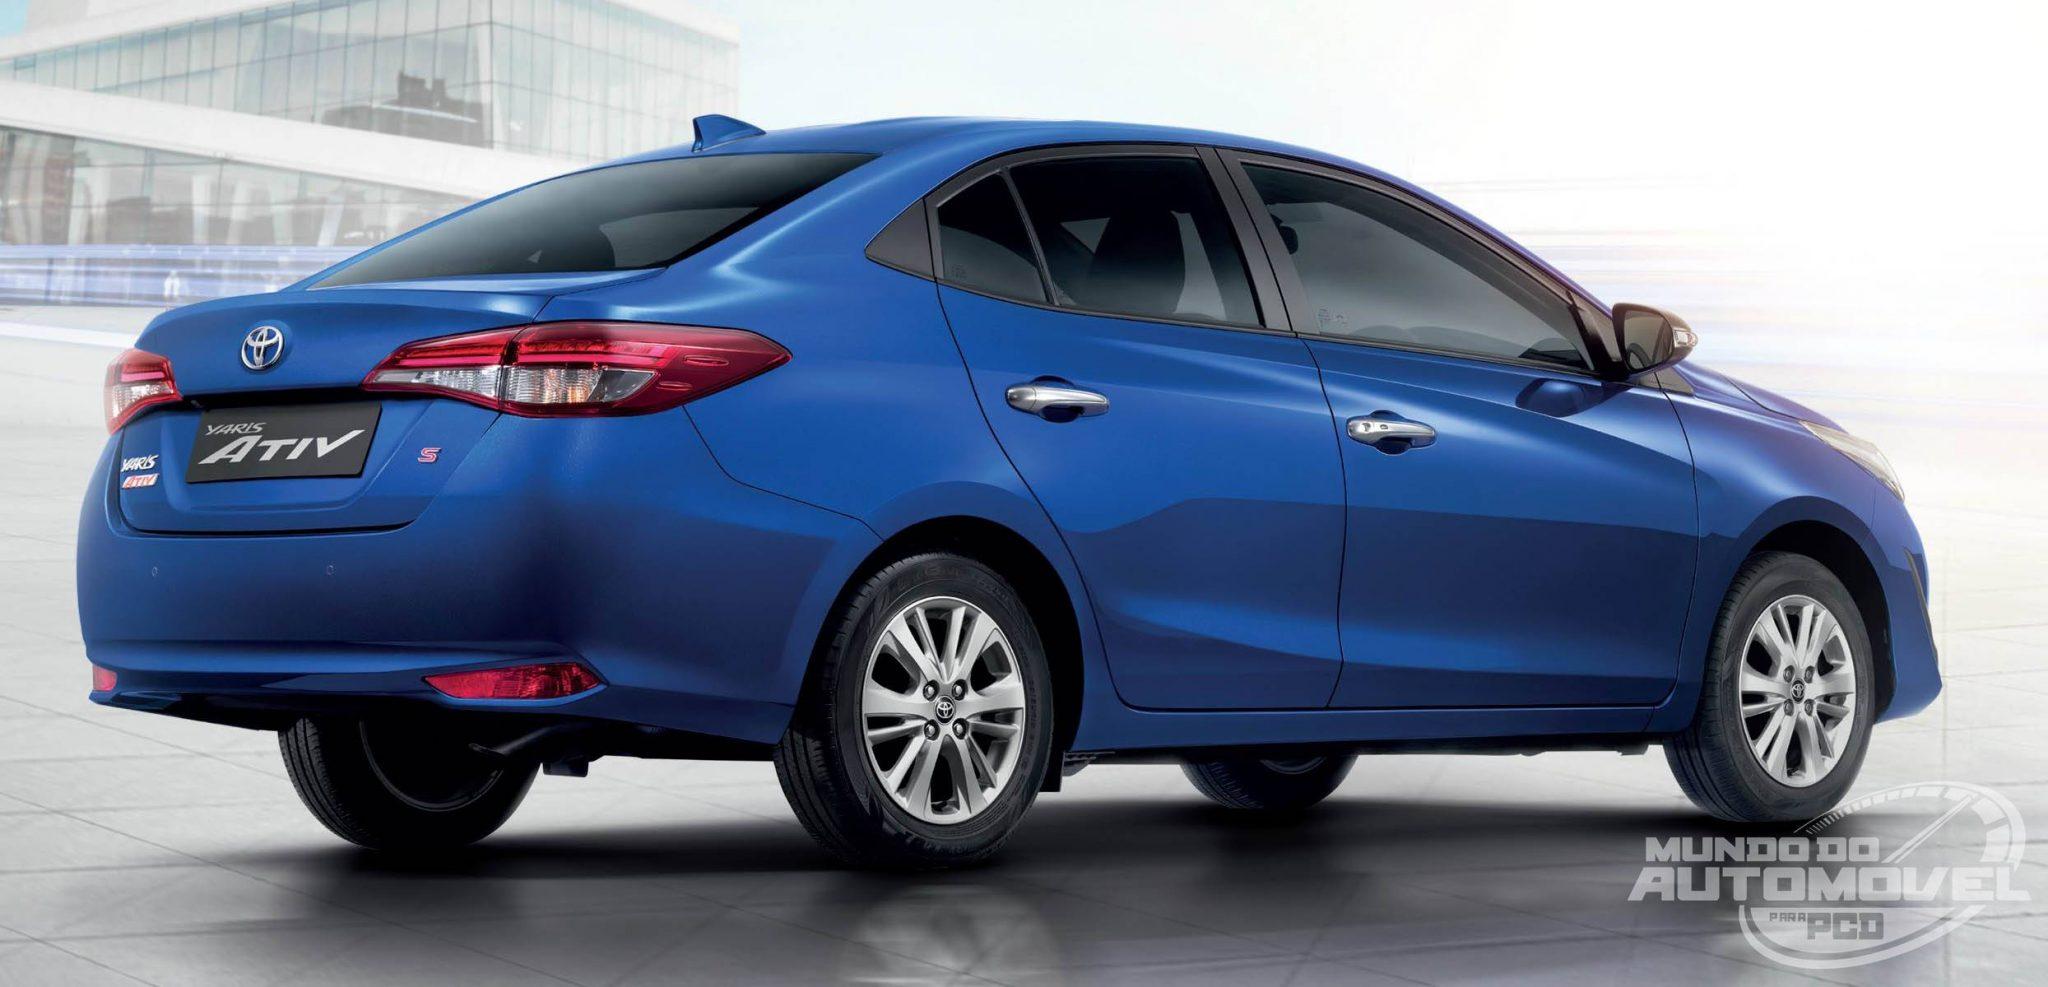 Toyota Yaris Ativ - Possível Substituto do Corolla GLI ...